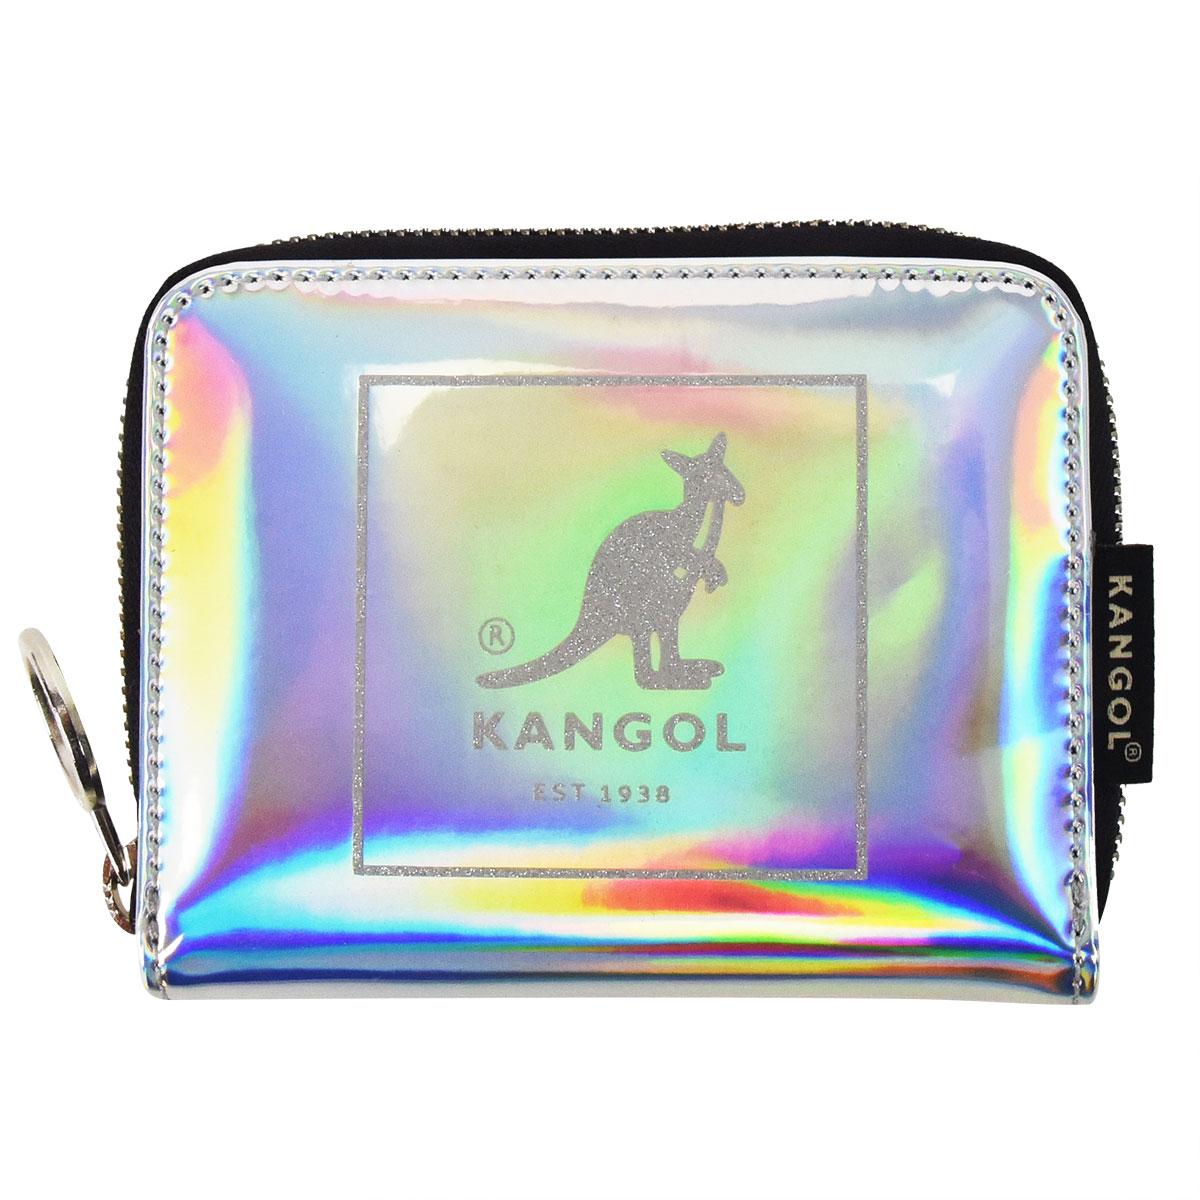 Kangol Prism Wallet in Silver